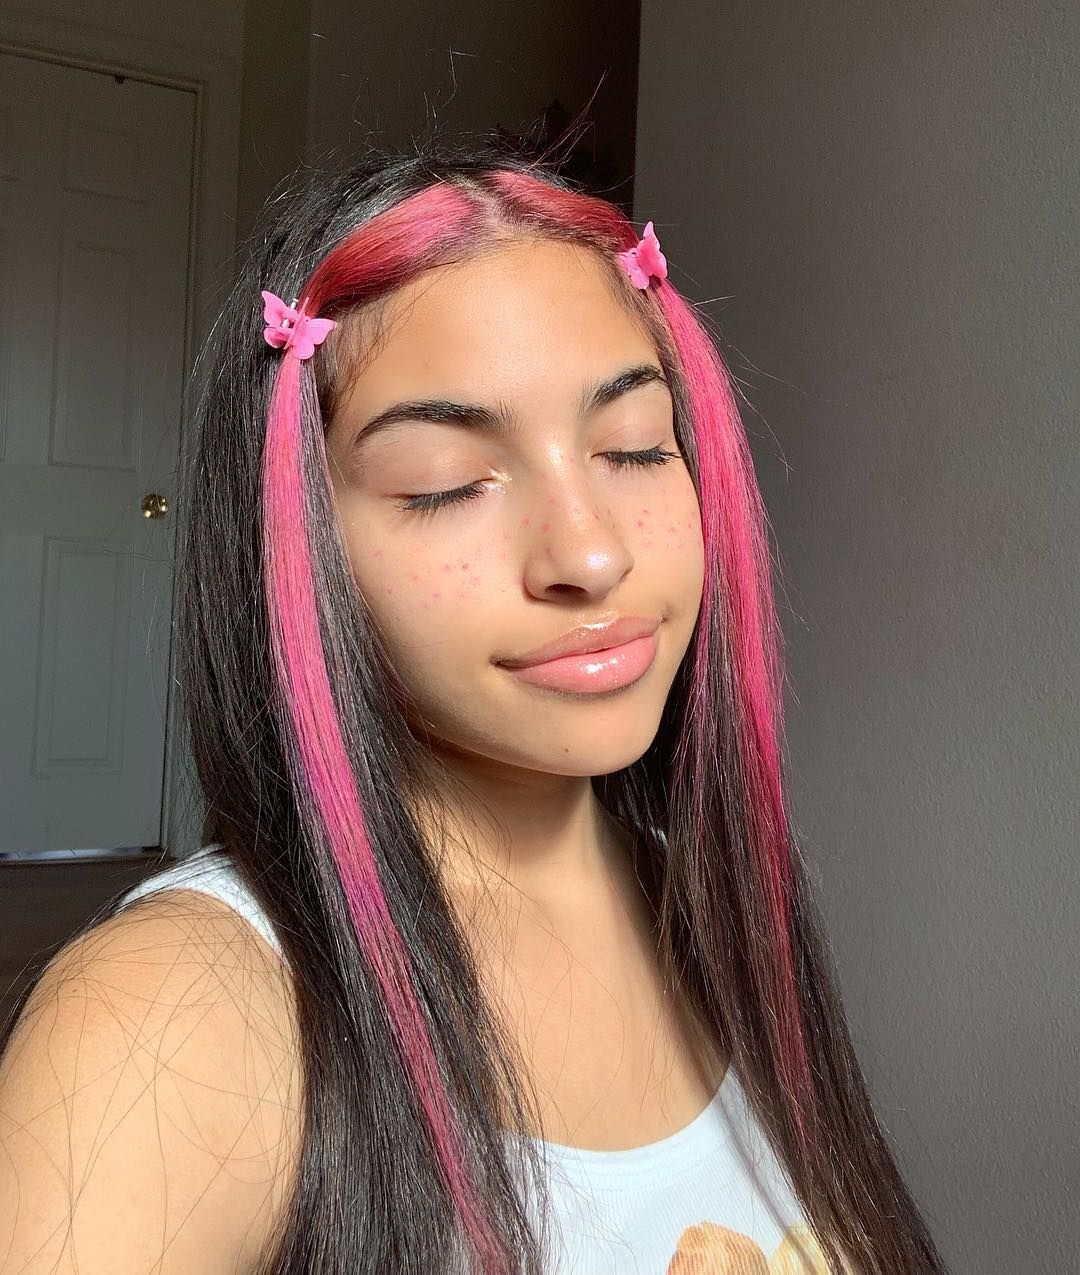 V 3 On Instagram Pink Hair Dont Care Hair Color Streaks Pink Hair Streaks Aesthetic Hair